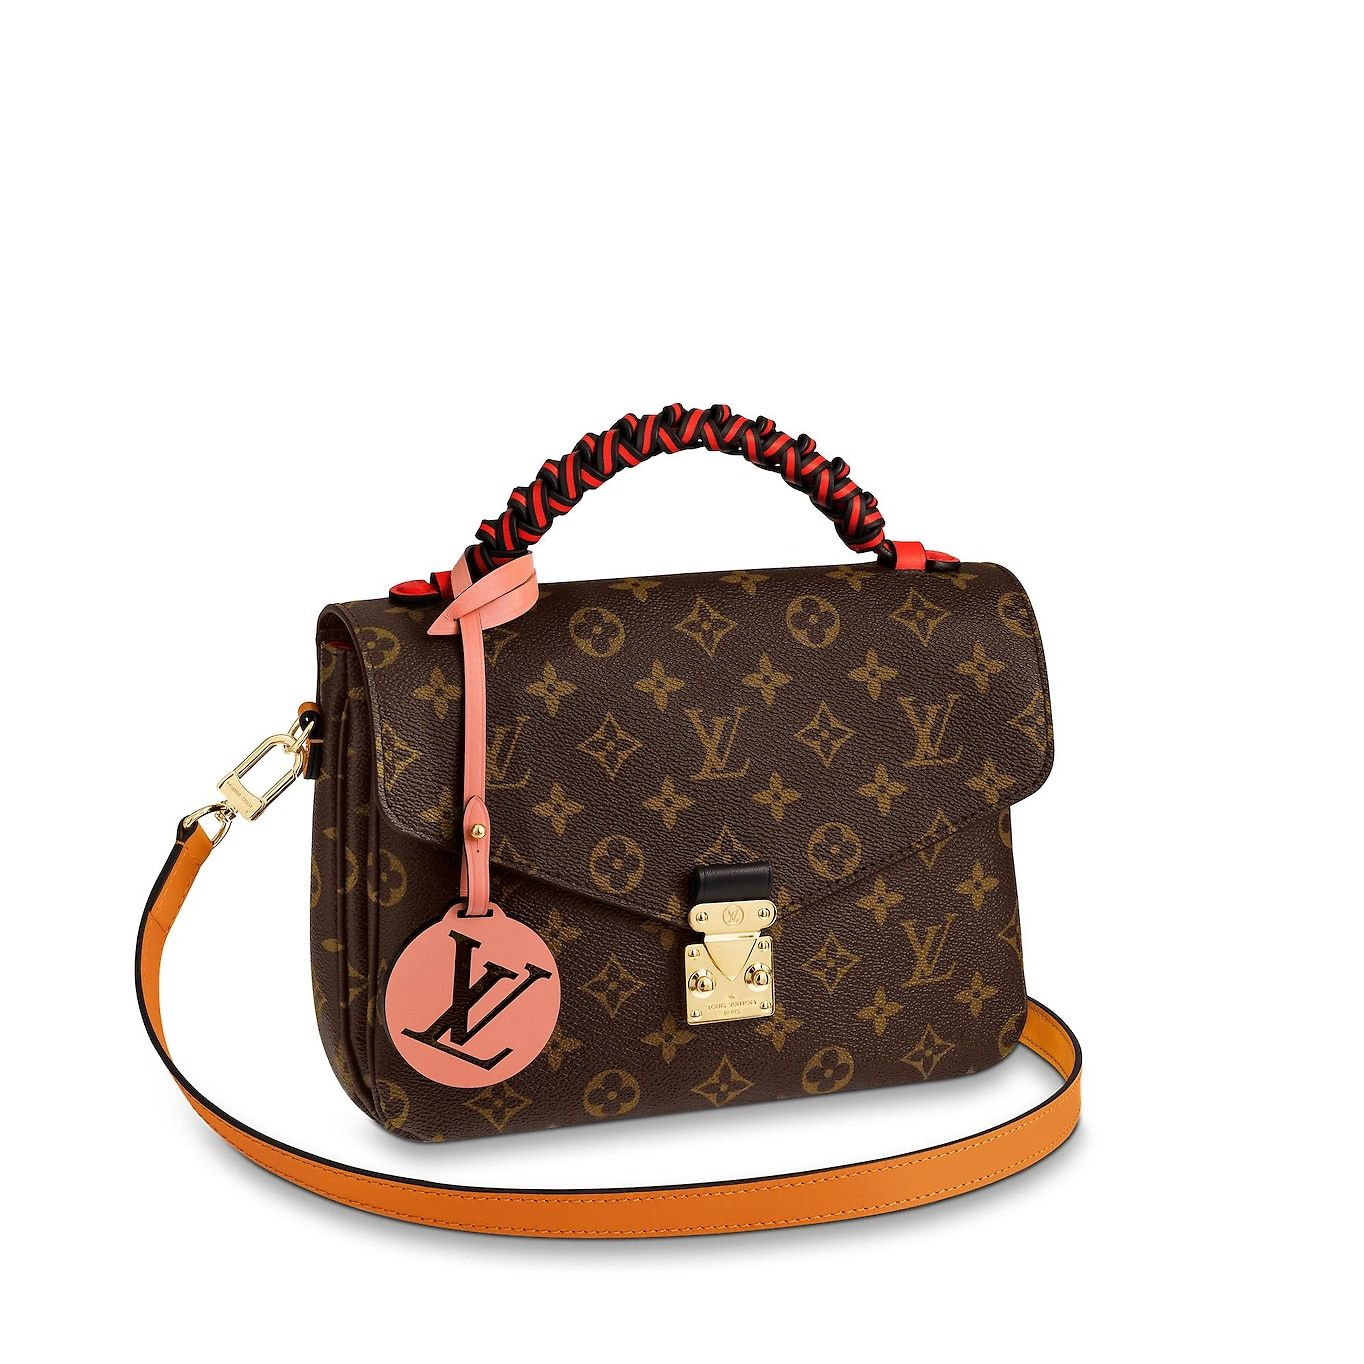 acc1f57a6 View 1 - Monogram HANDBAGS All Handbags Pochette Metis | Louis Vuitton ®